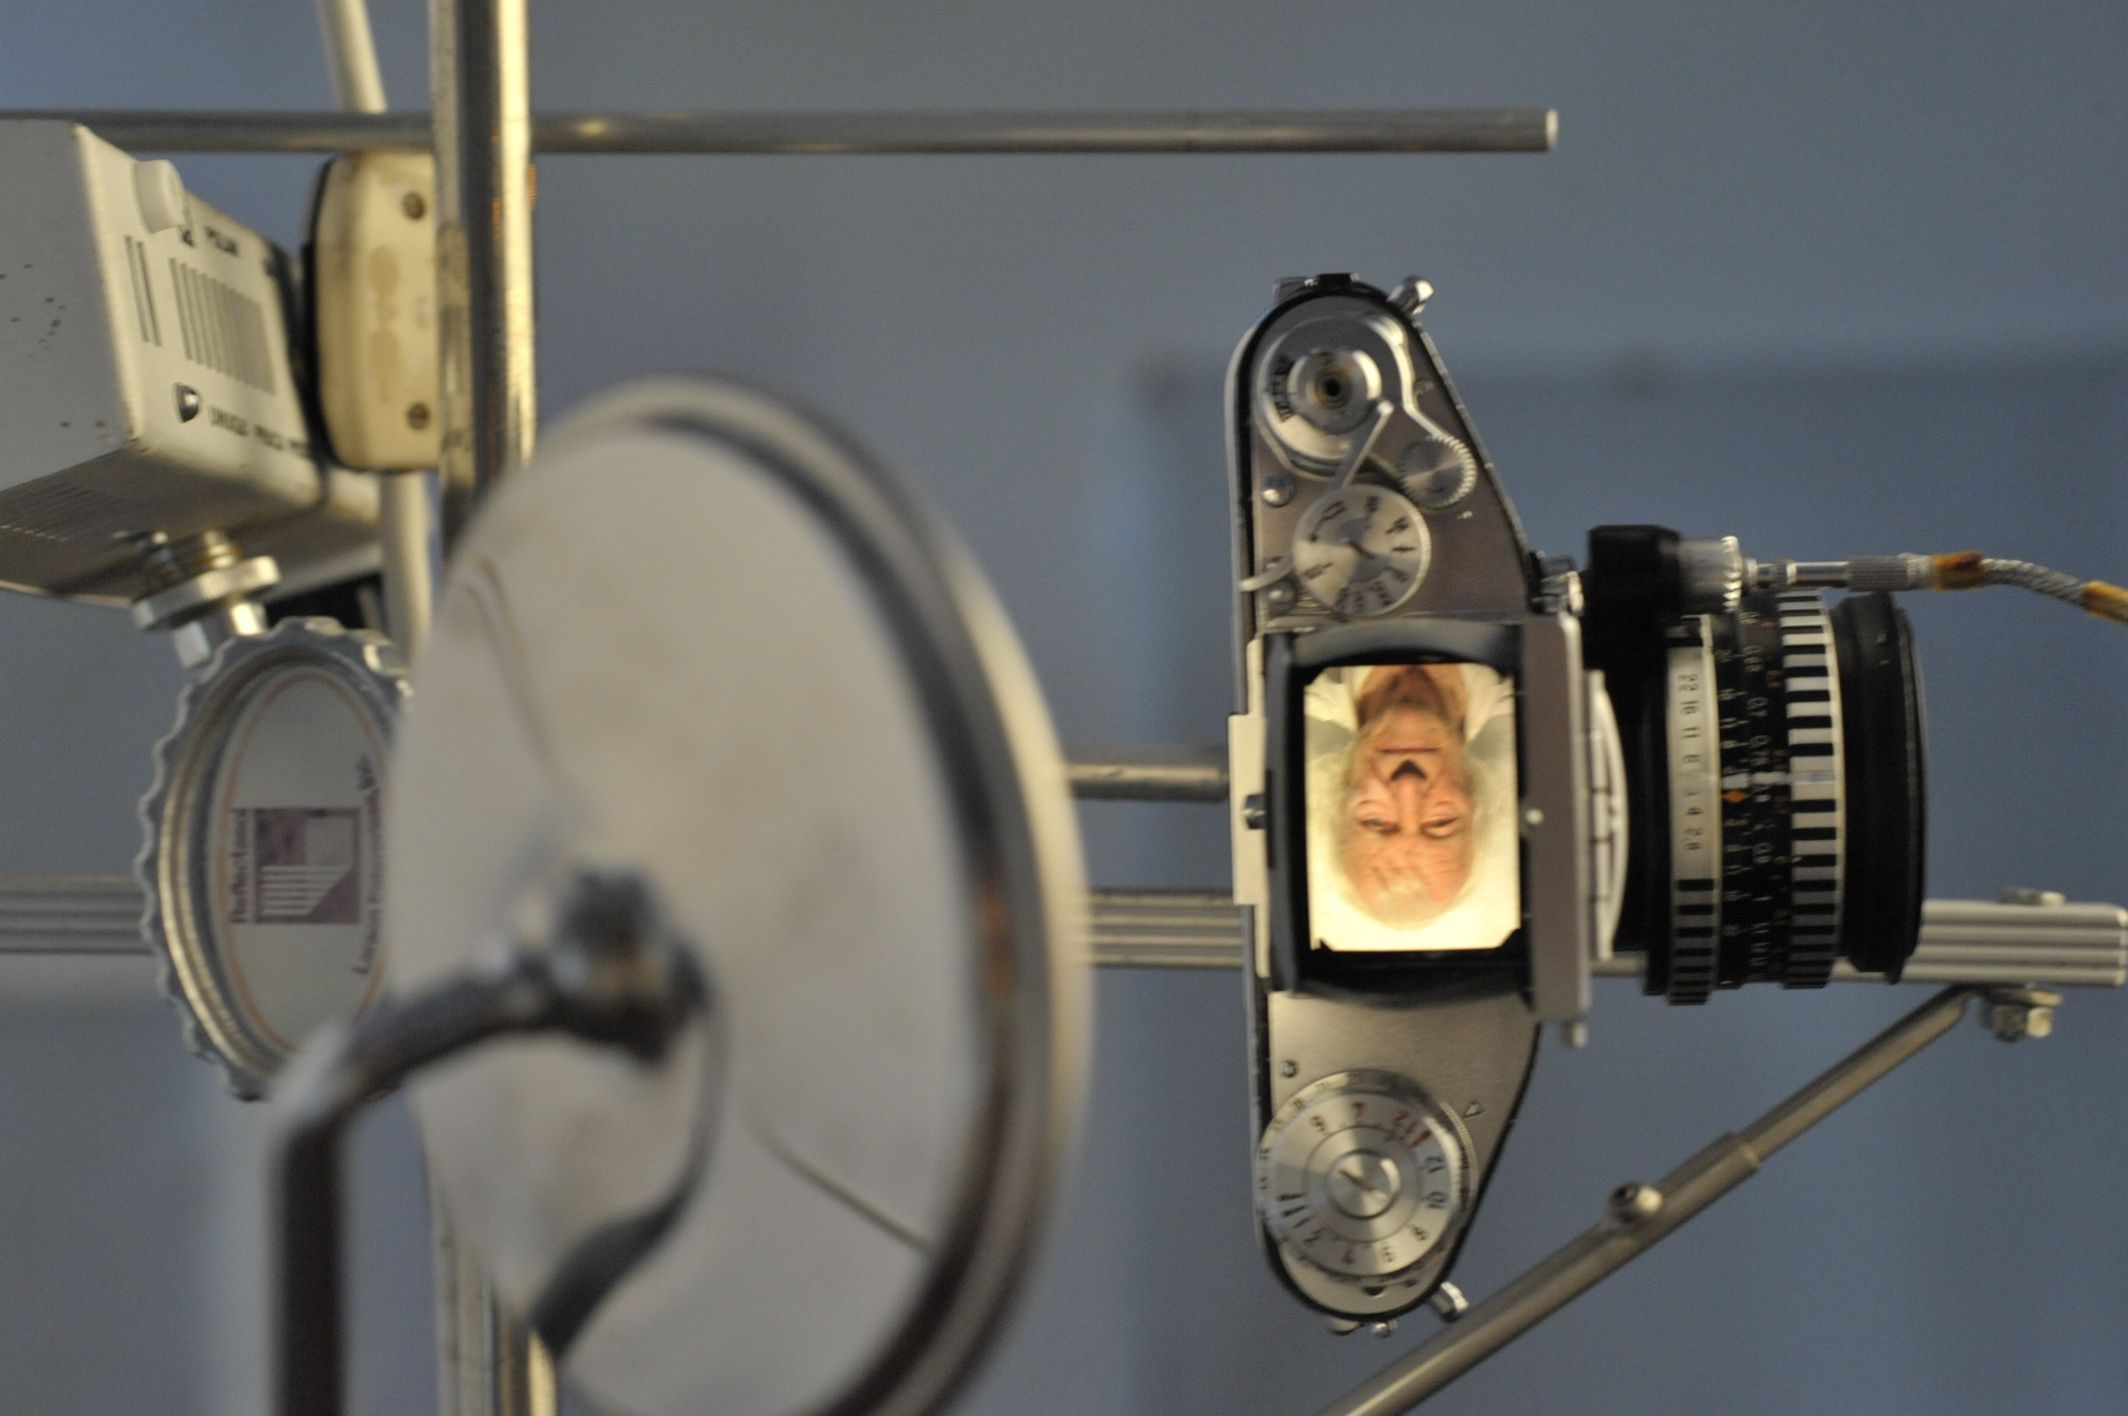 A Venezia e Milano, Roman Opałka è protagonista di una mostra in due capitoli